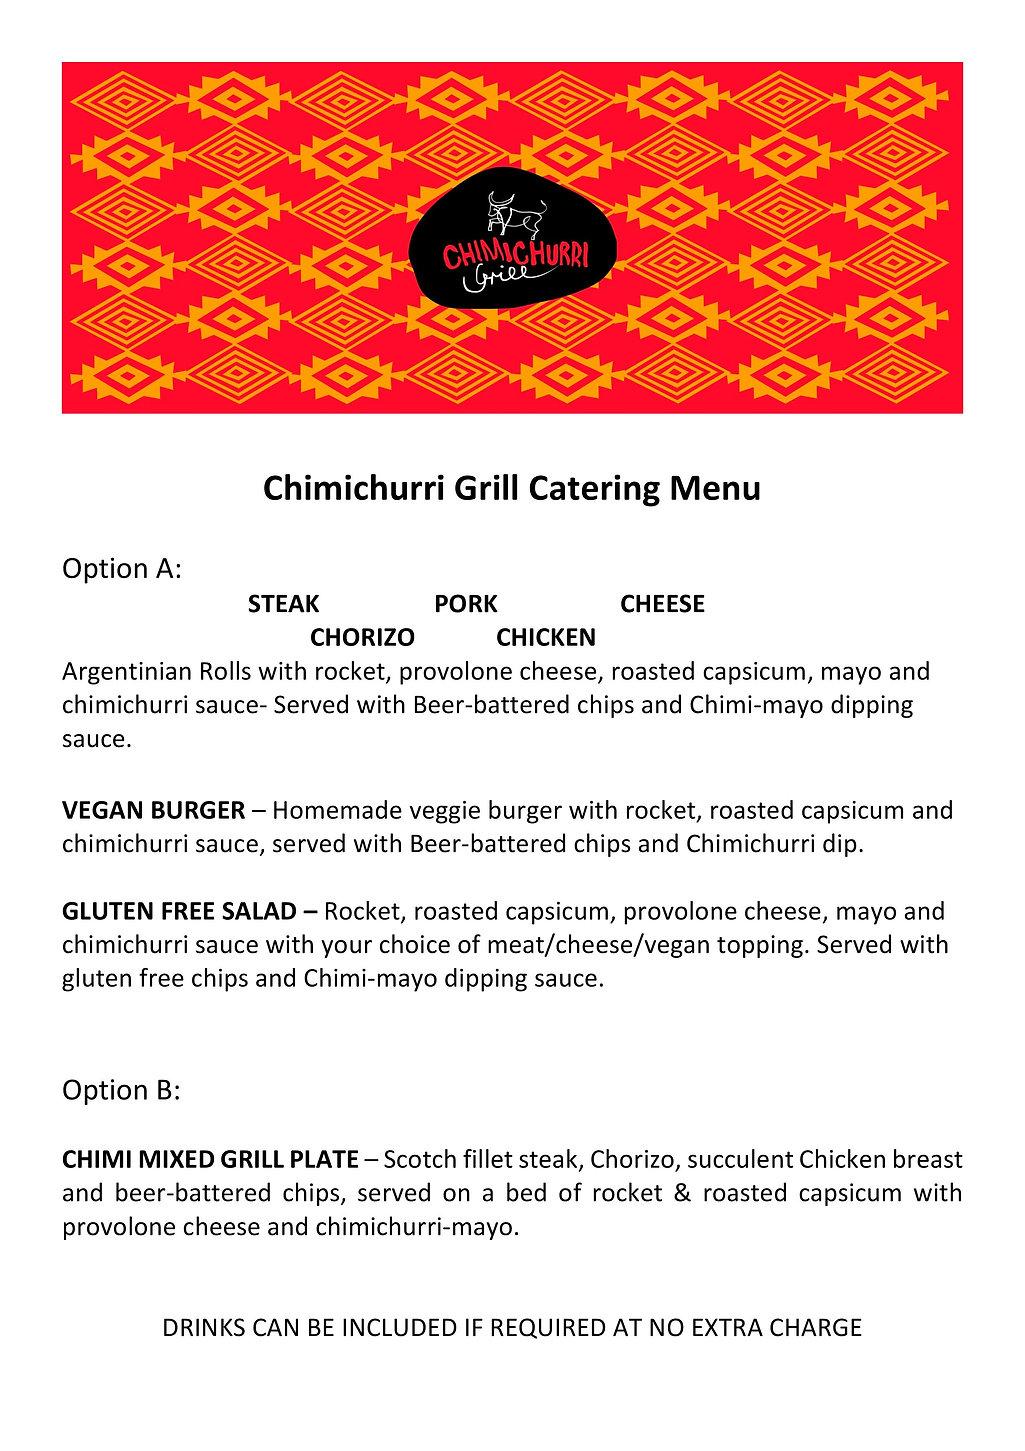 Chimichurri Grill Catering menu NP 2020-